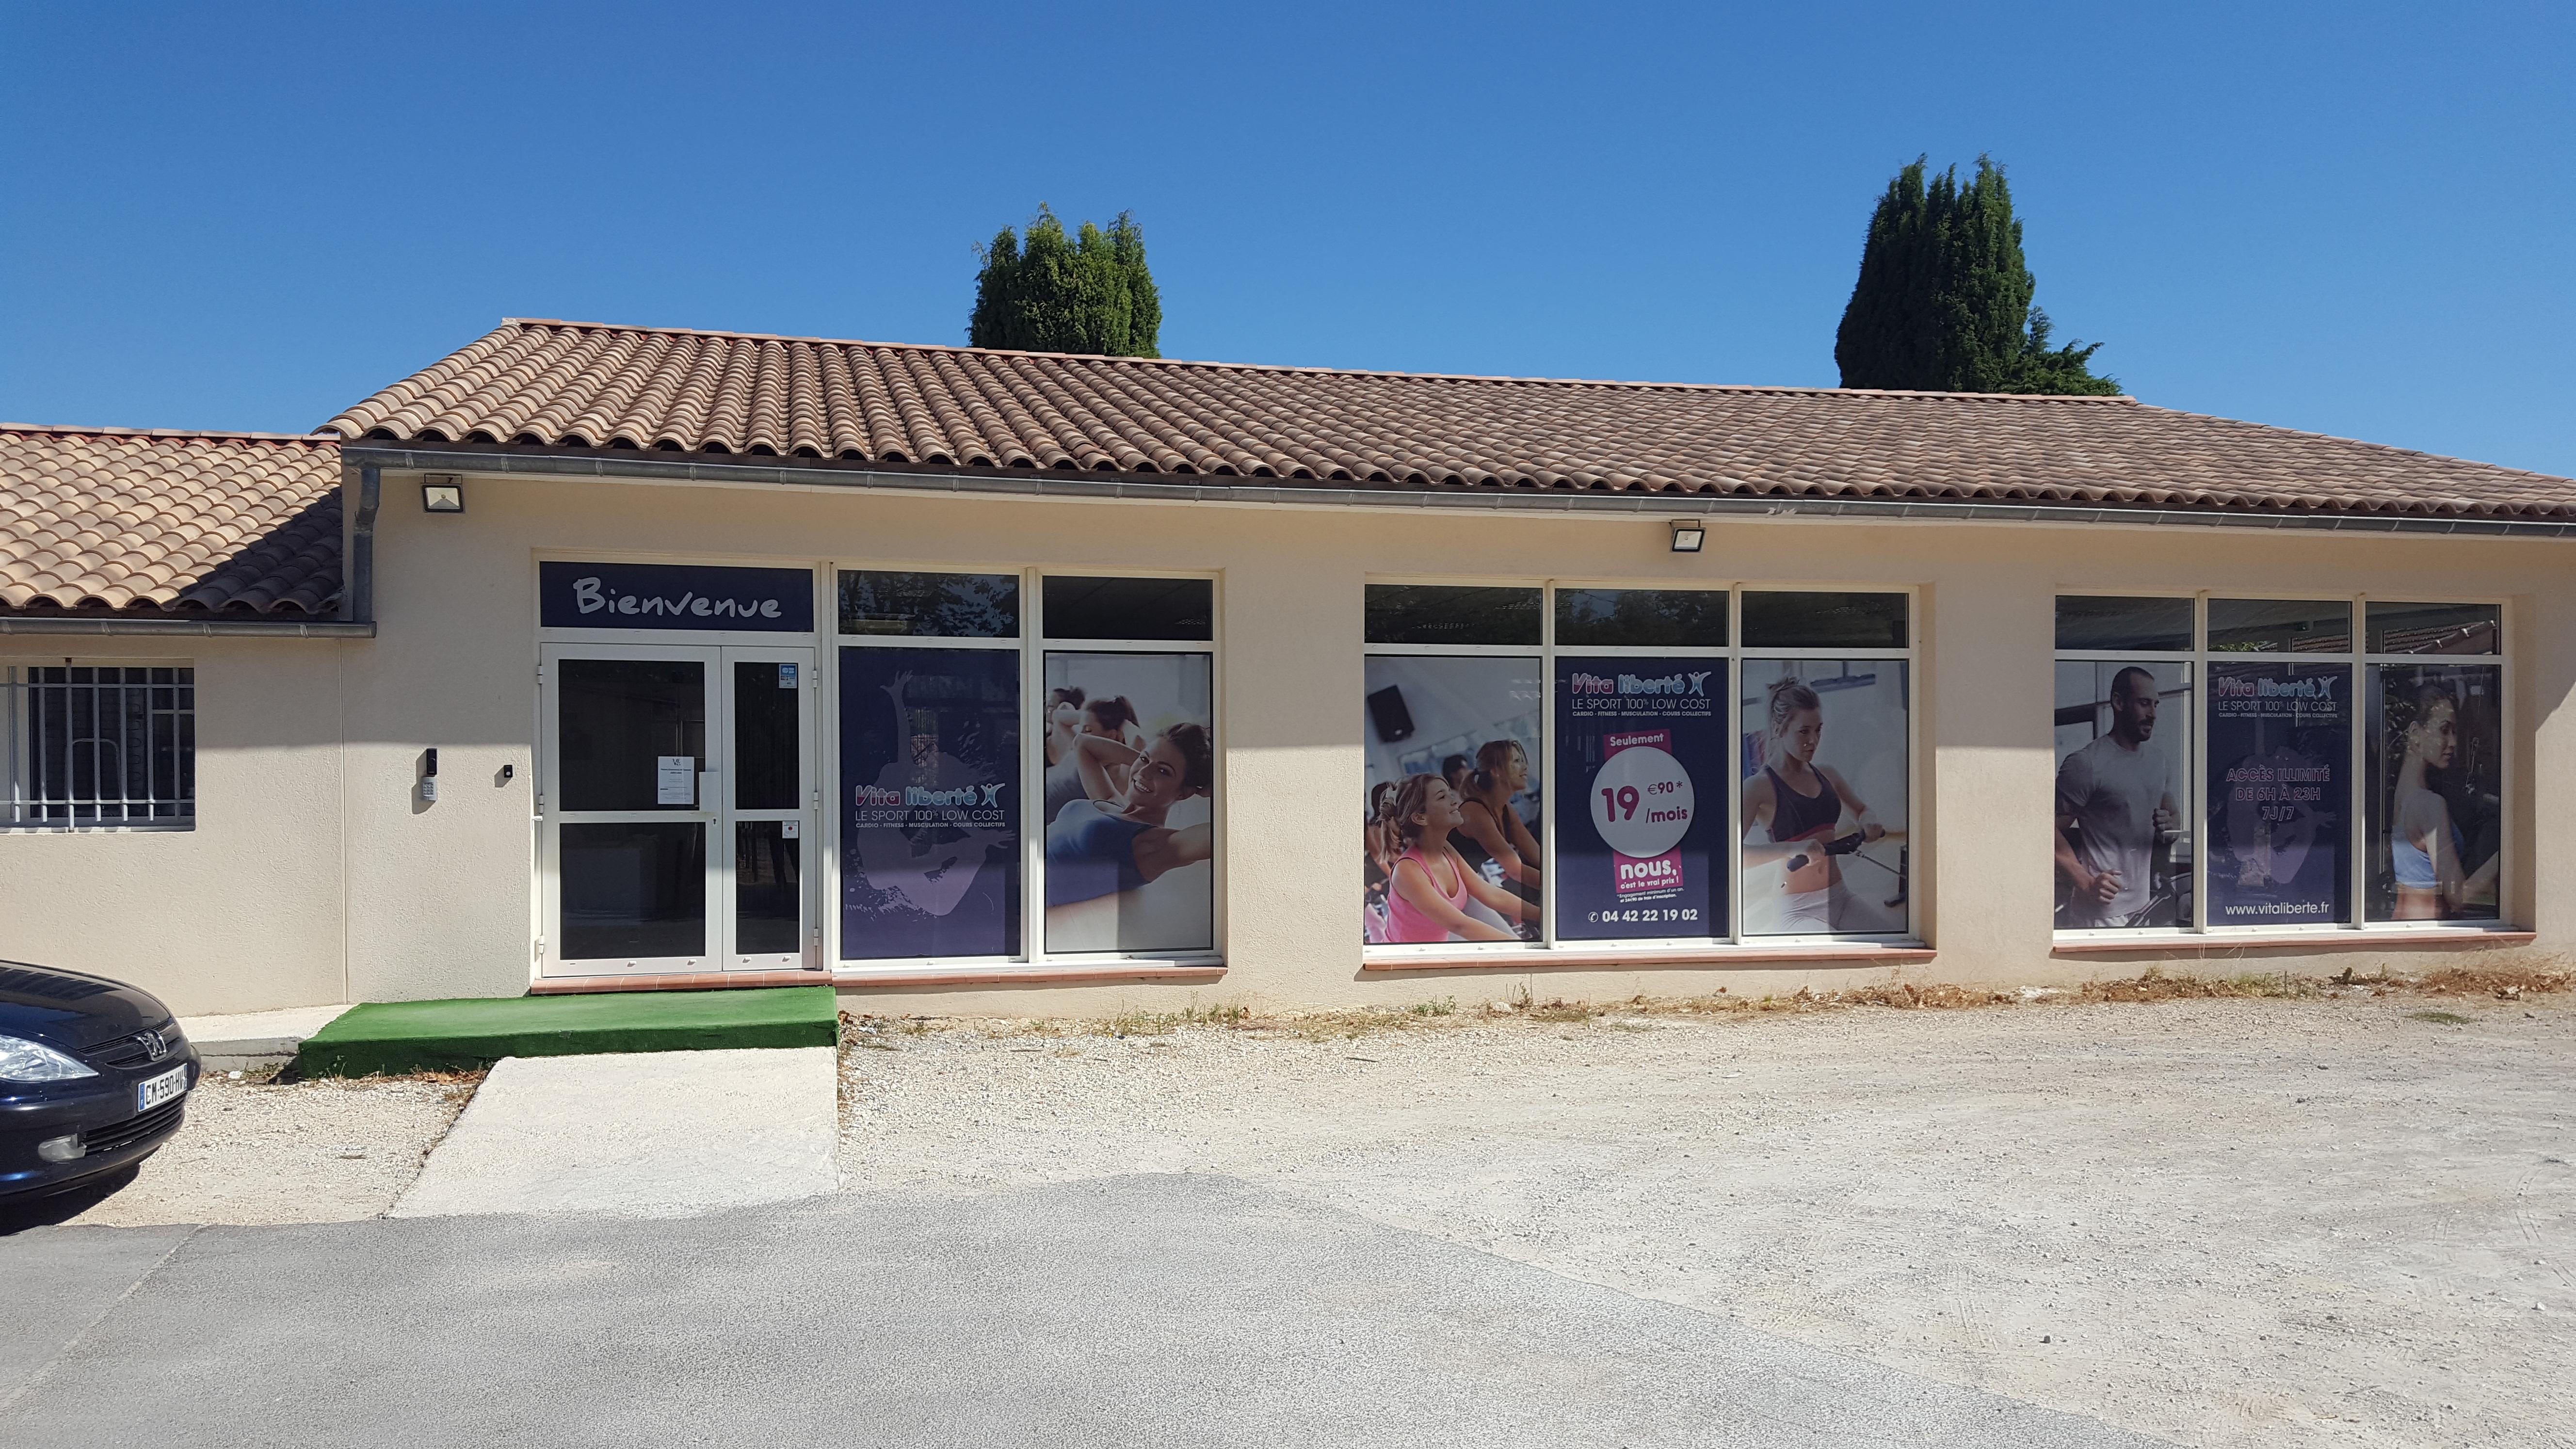 Salle De Sport Aix En Provence Pas Cher Vita Liberte